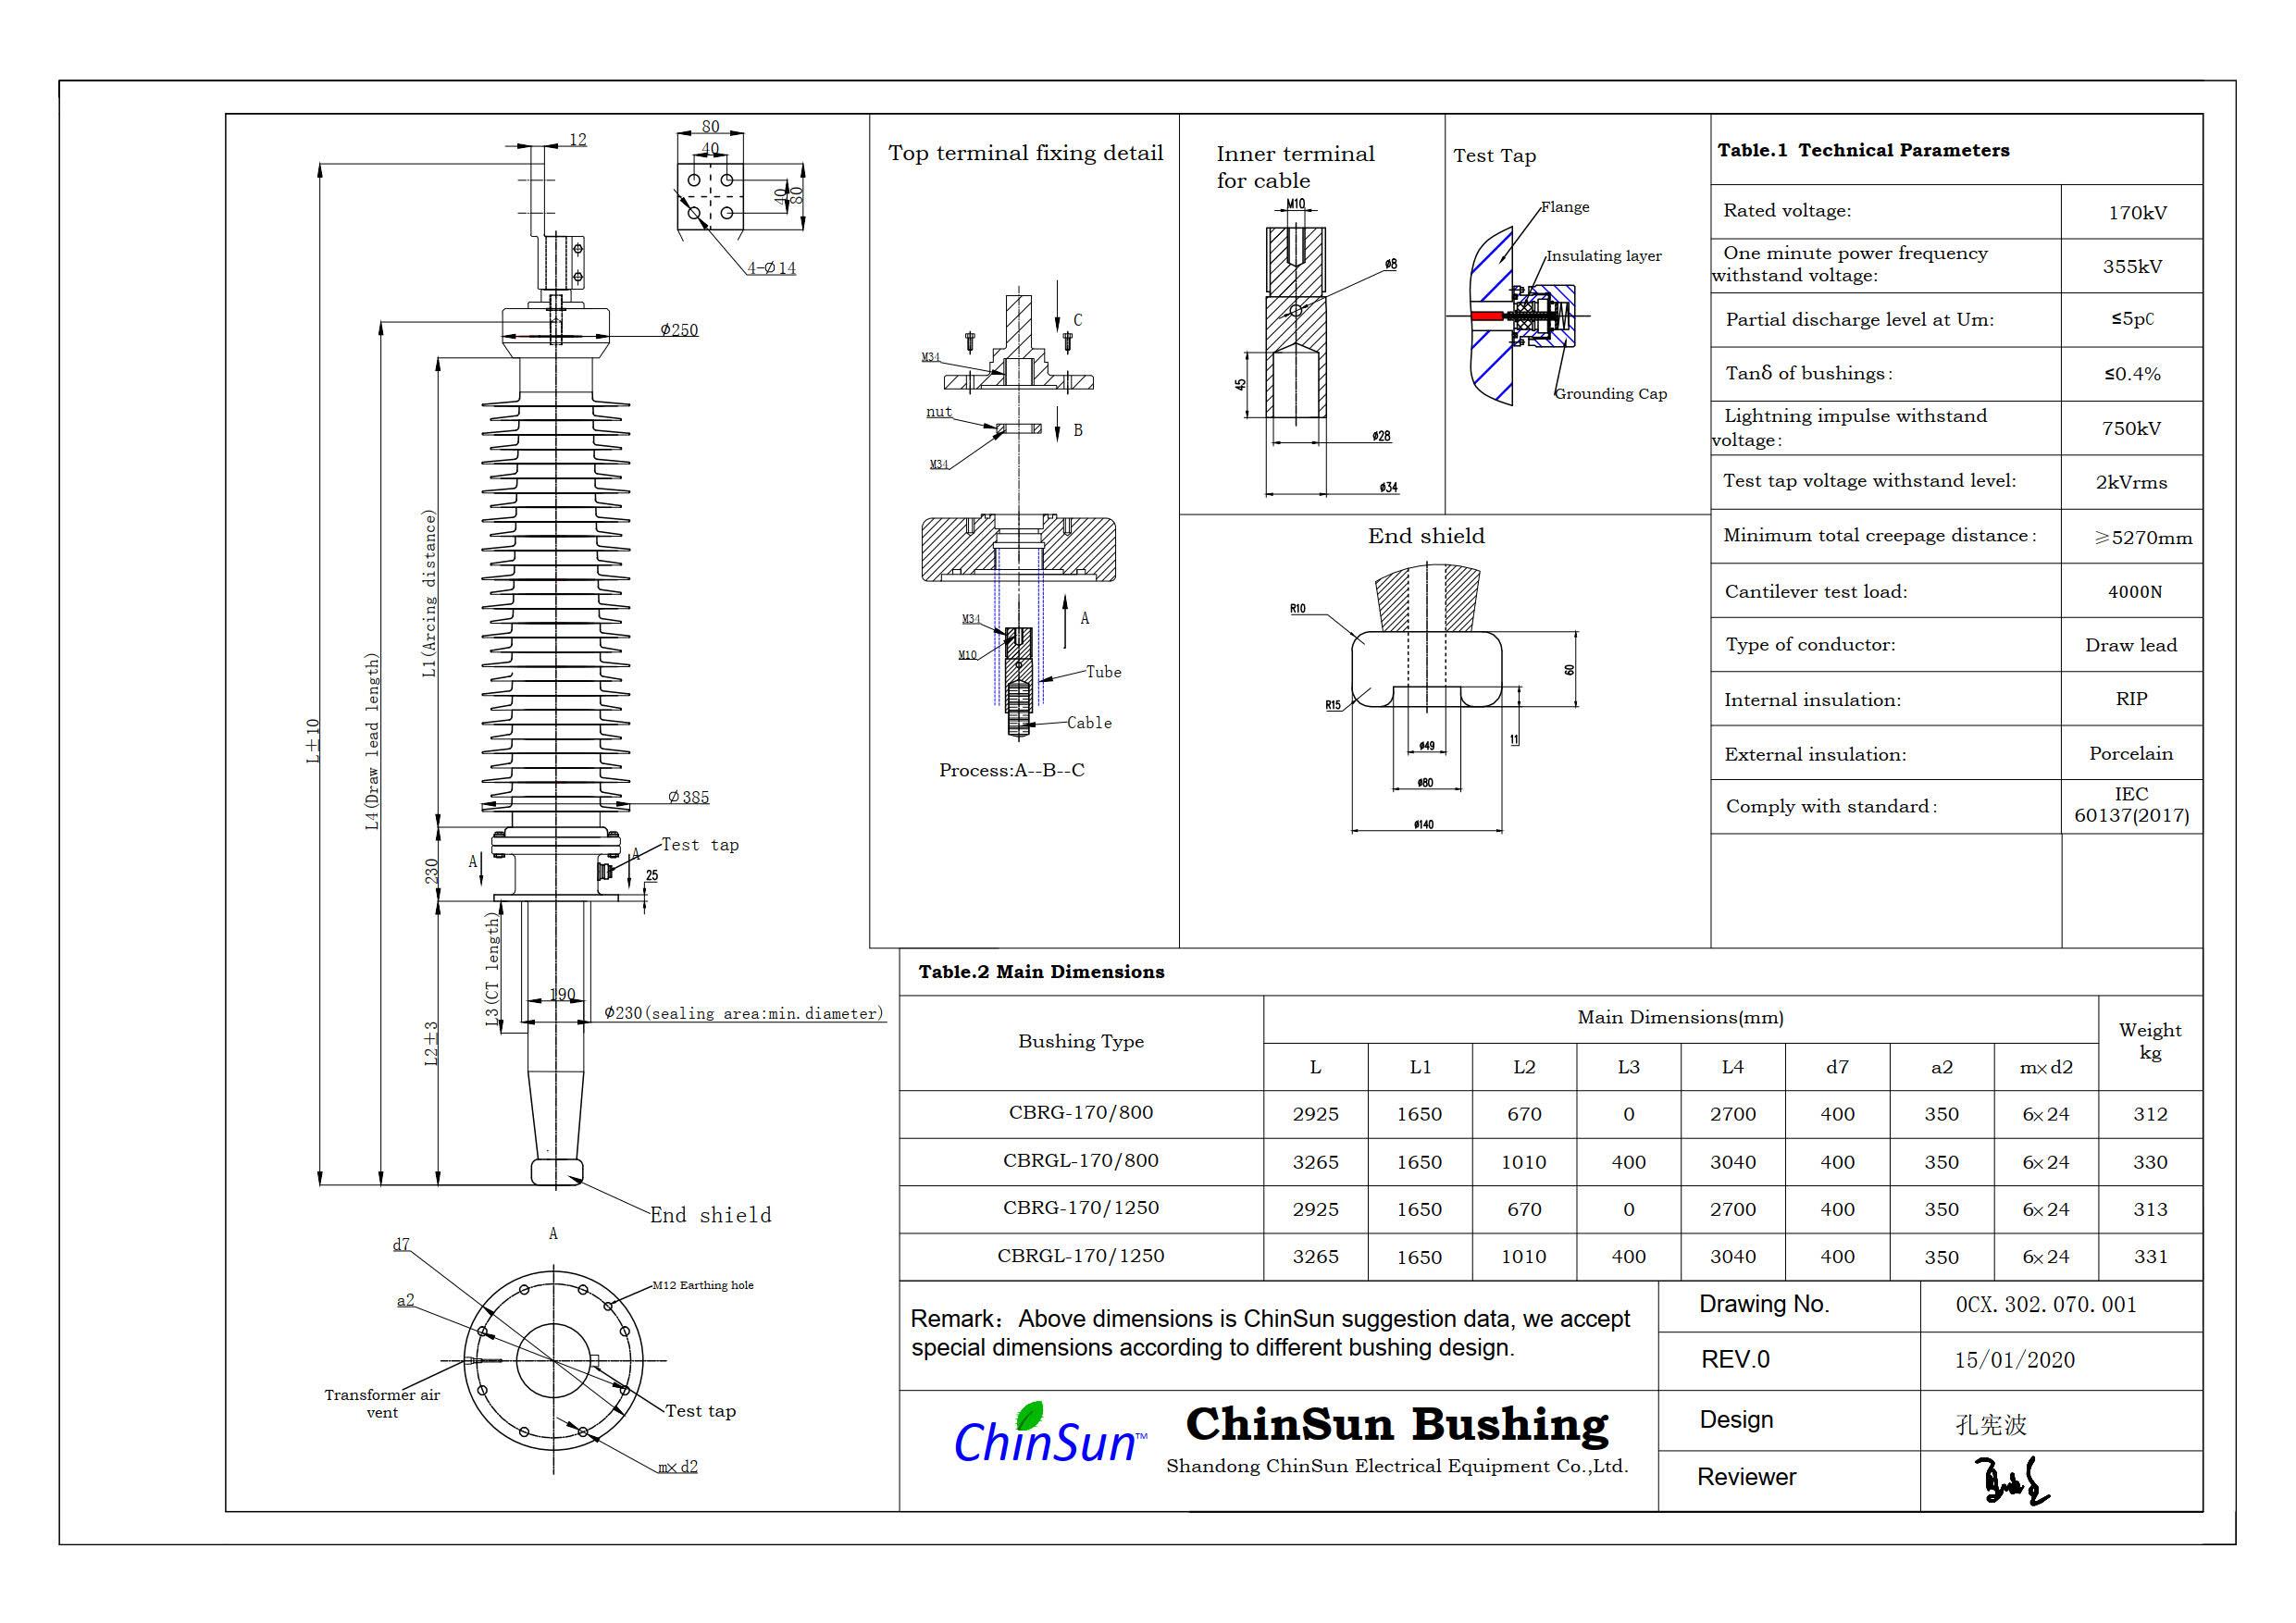 Drawing-transformer bushing-170kV_Porcelain-DL-ChinSun